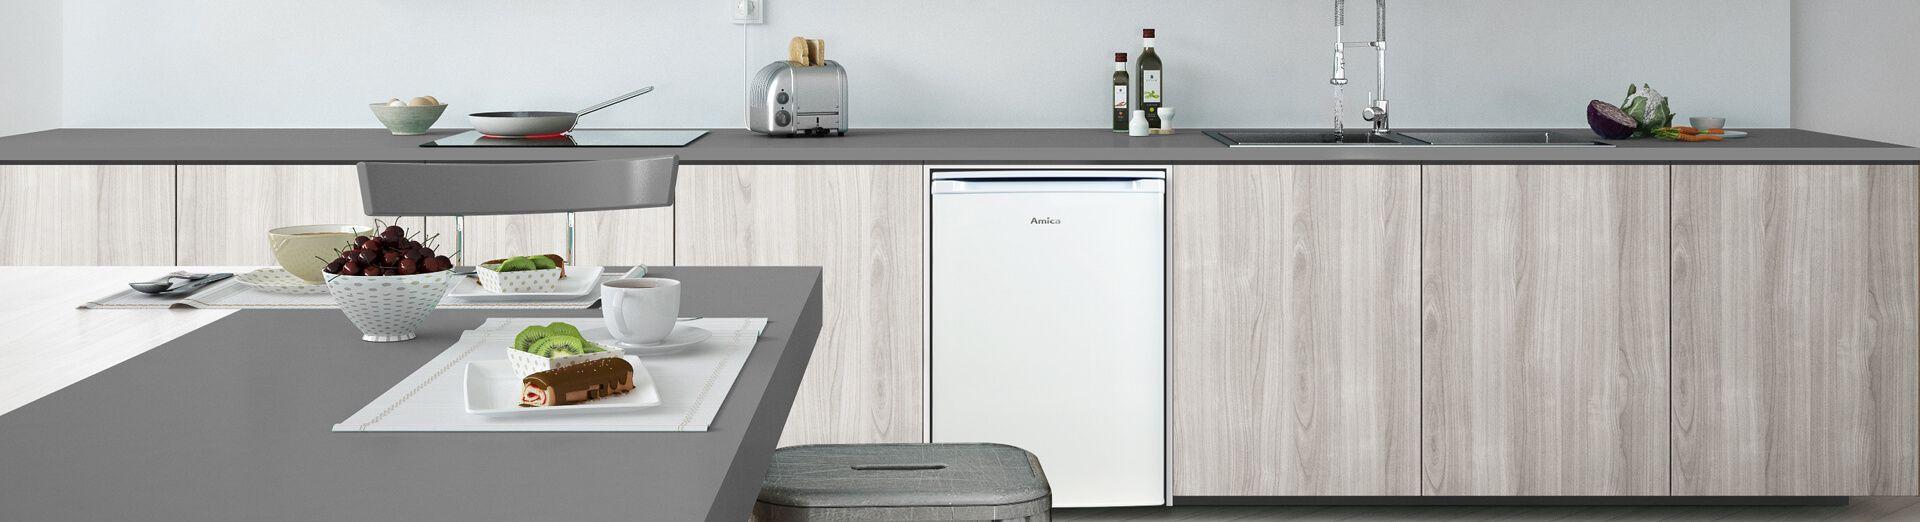 Freezers: Upright & Under Counter Freestanding Freezers | Amica